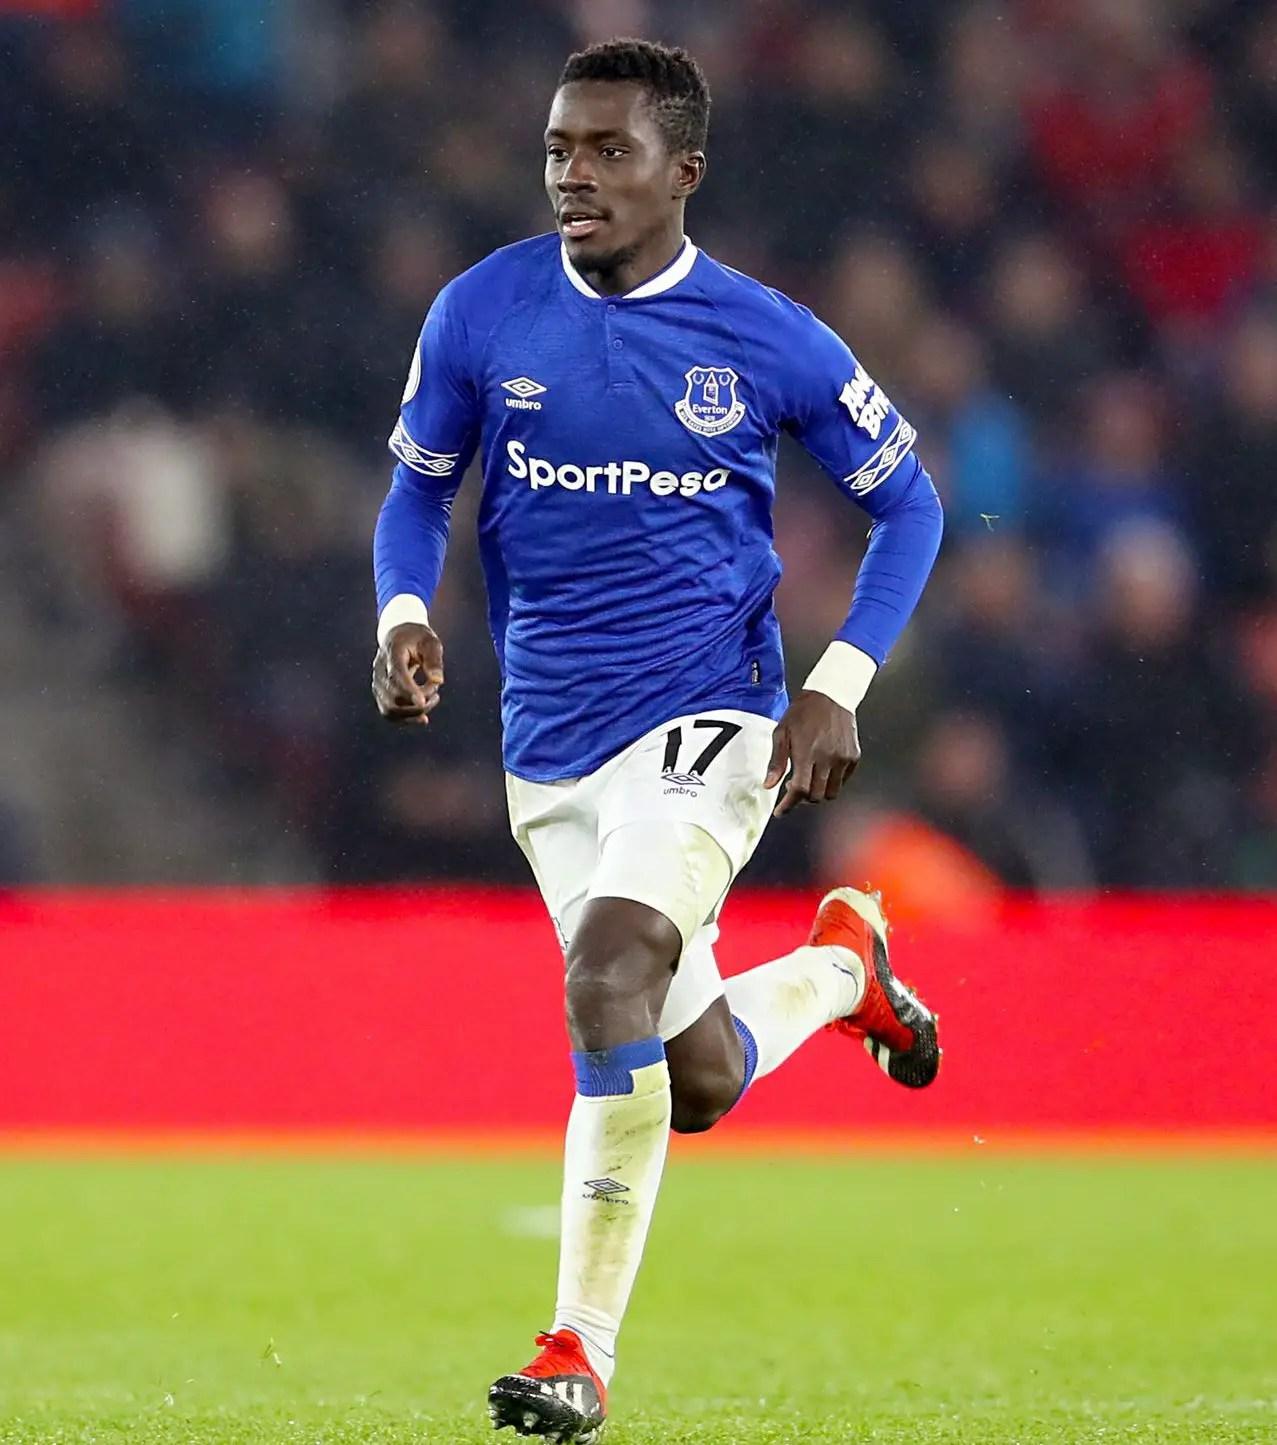 Gueye Departs Goodison For PSG